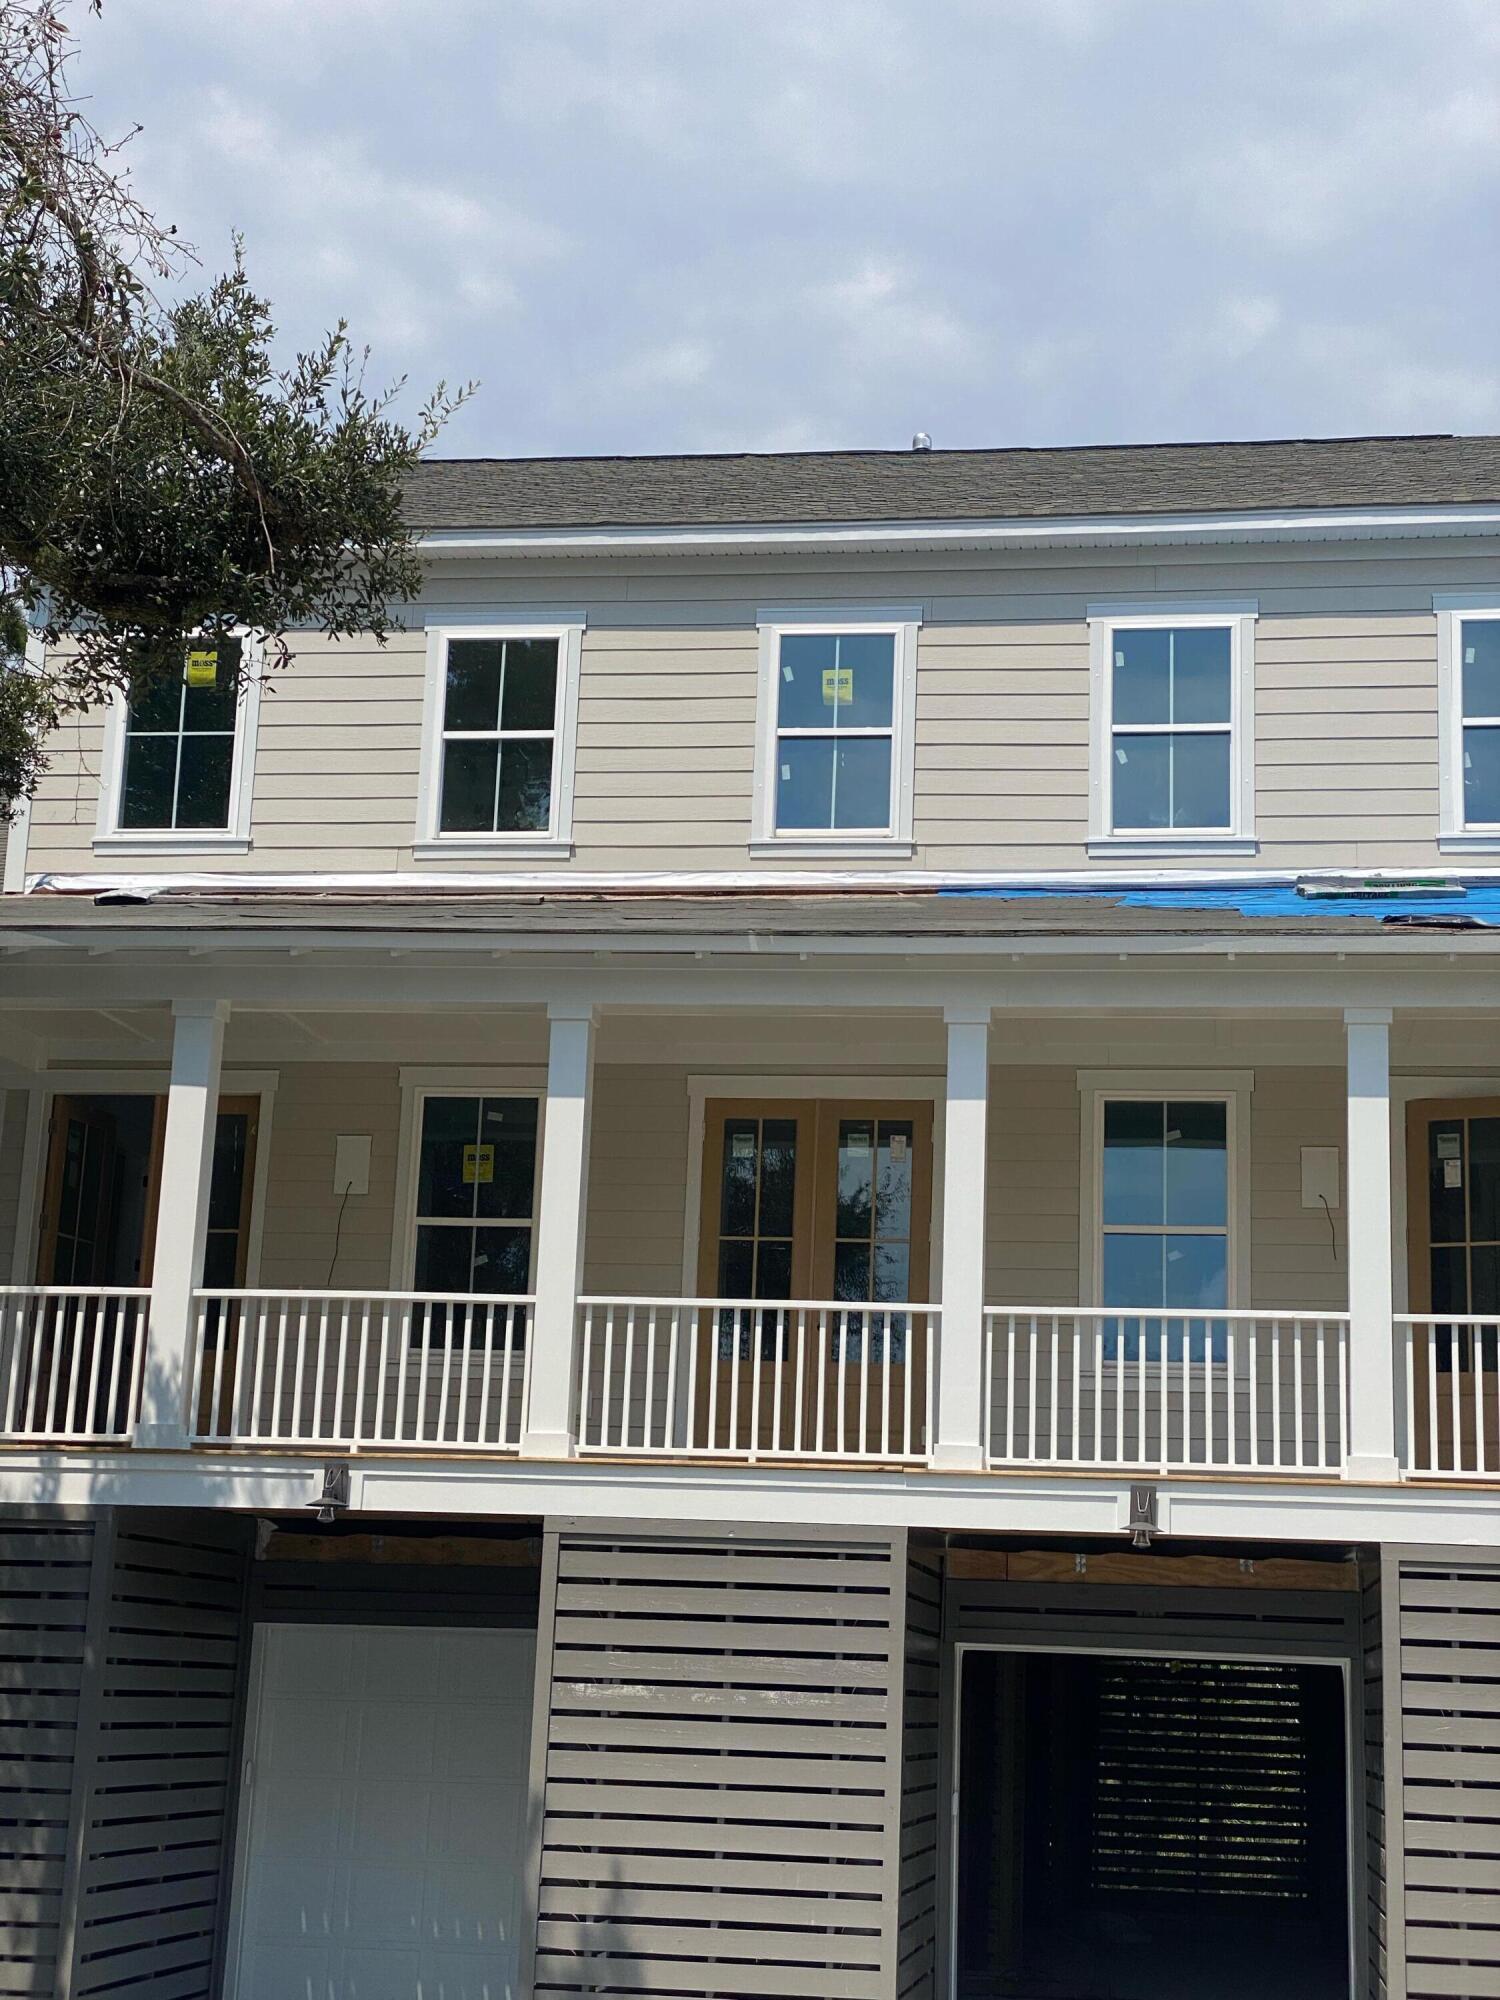 Battery Gaillard Homes For Sale - 2164 Military, Charleston, SC - 8